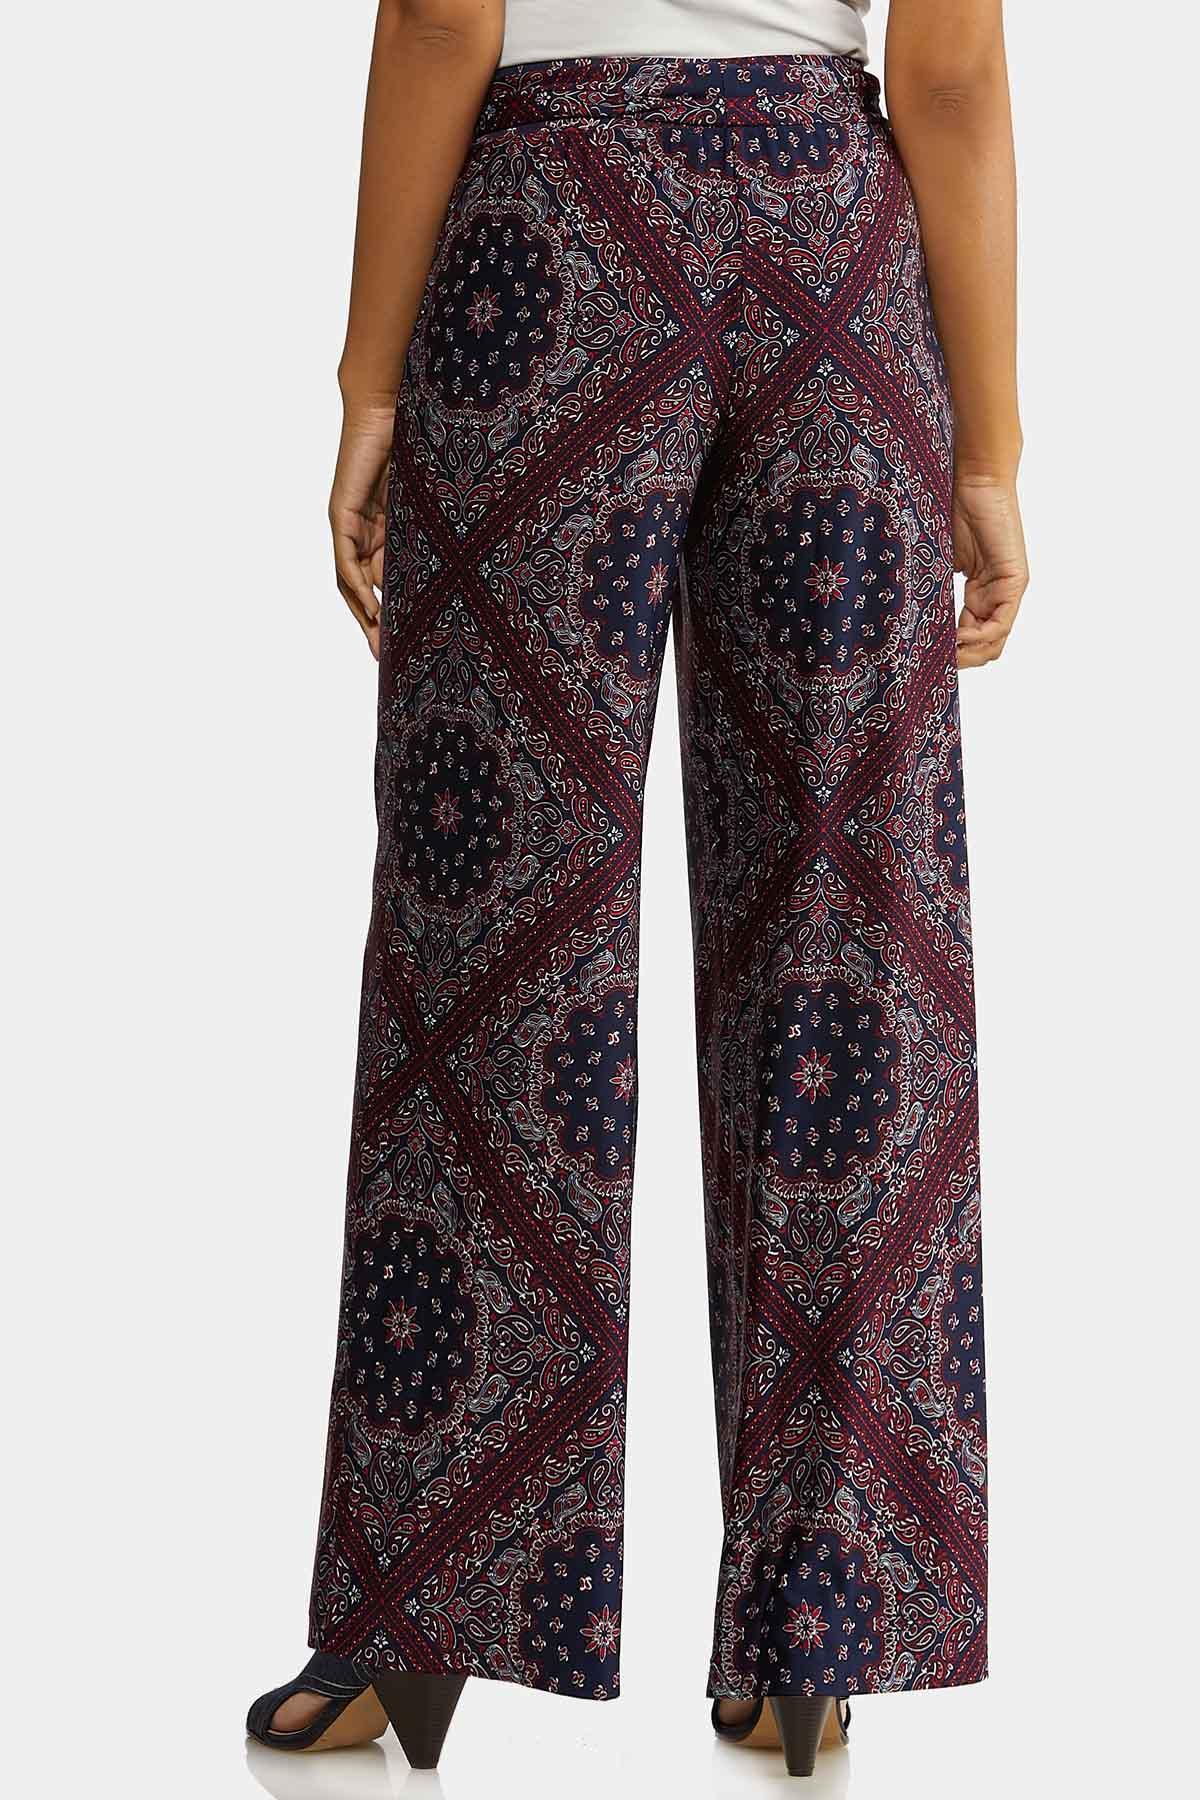 Petite Moroccan Tie Front Pants (Item #44269584)